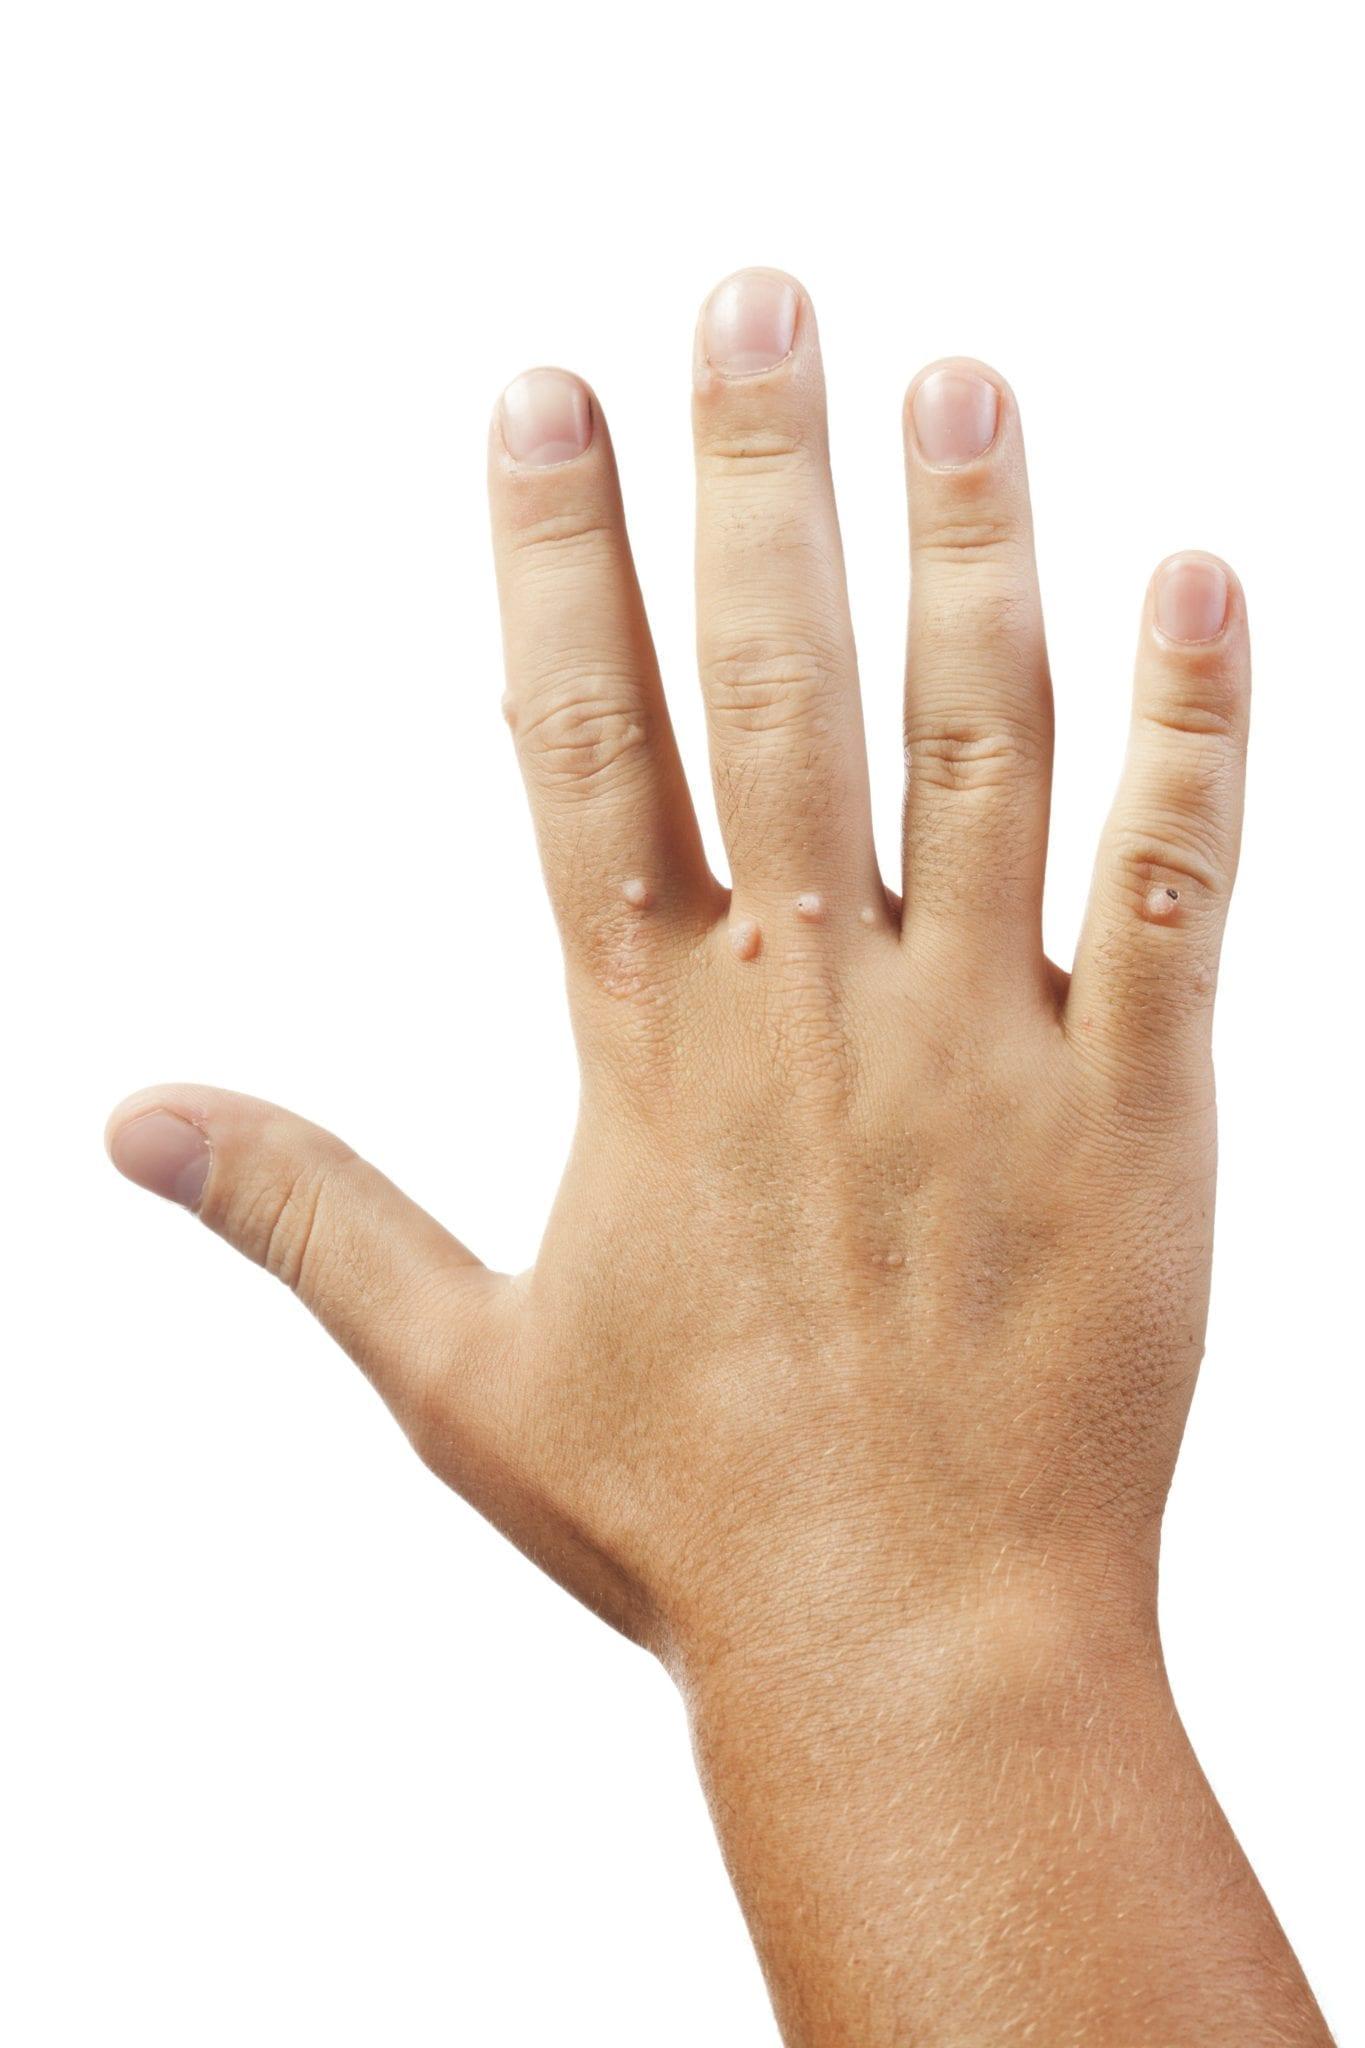 genital hpv hands